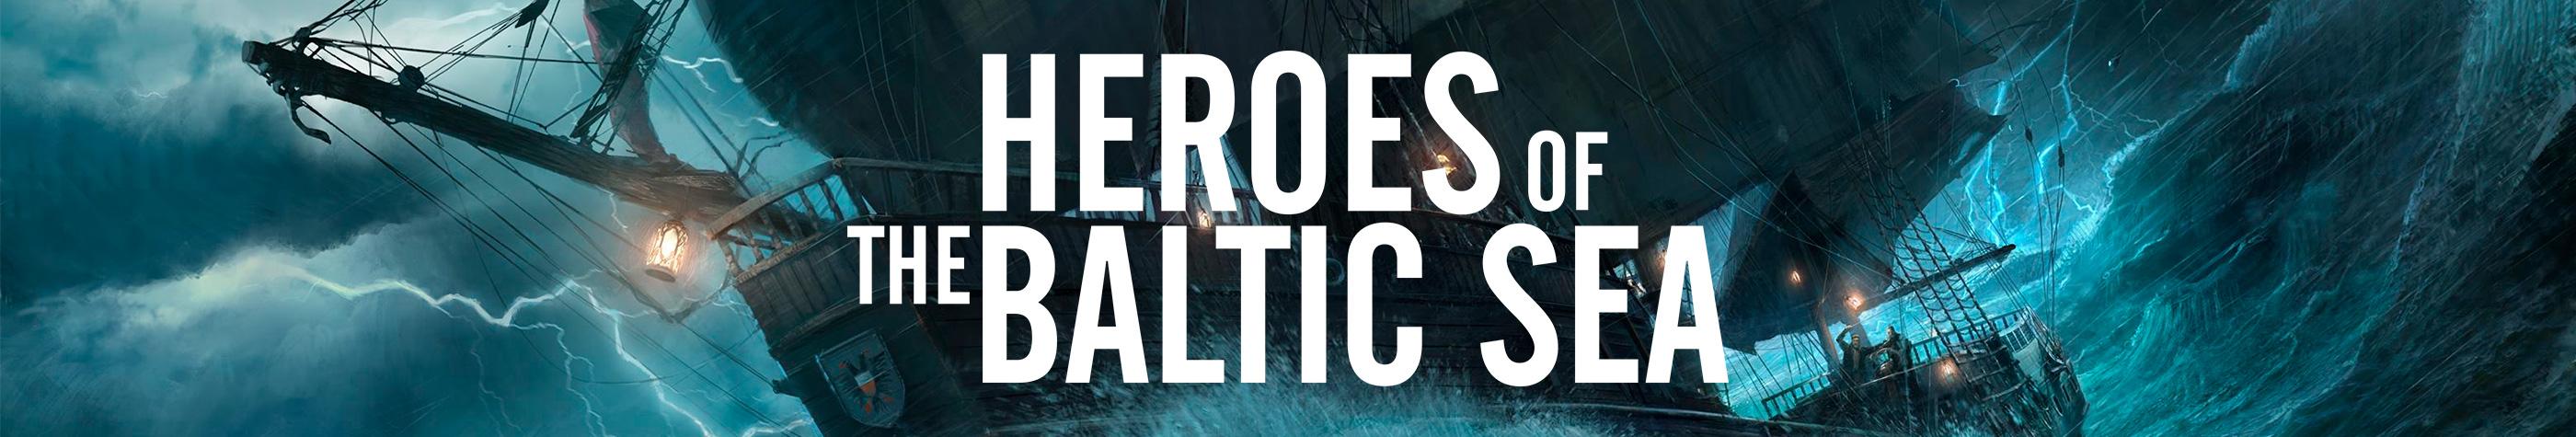 Aihesivun The Heroes of The Baltic Sea pääkuva